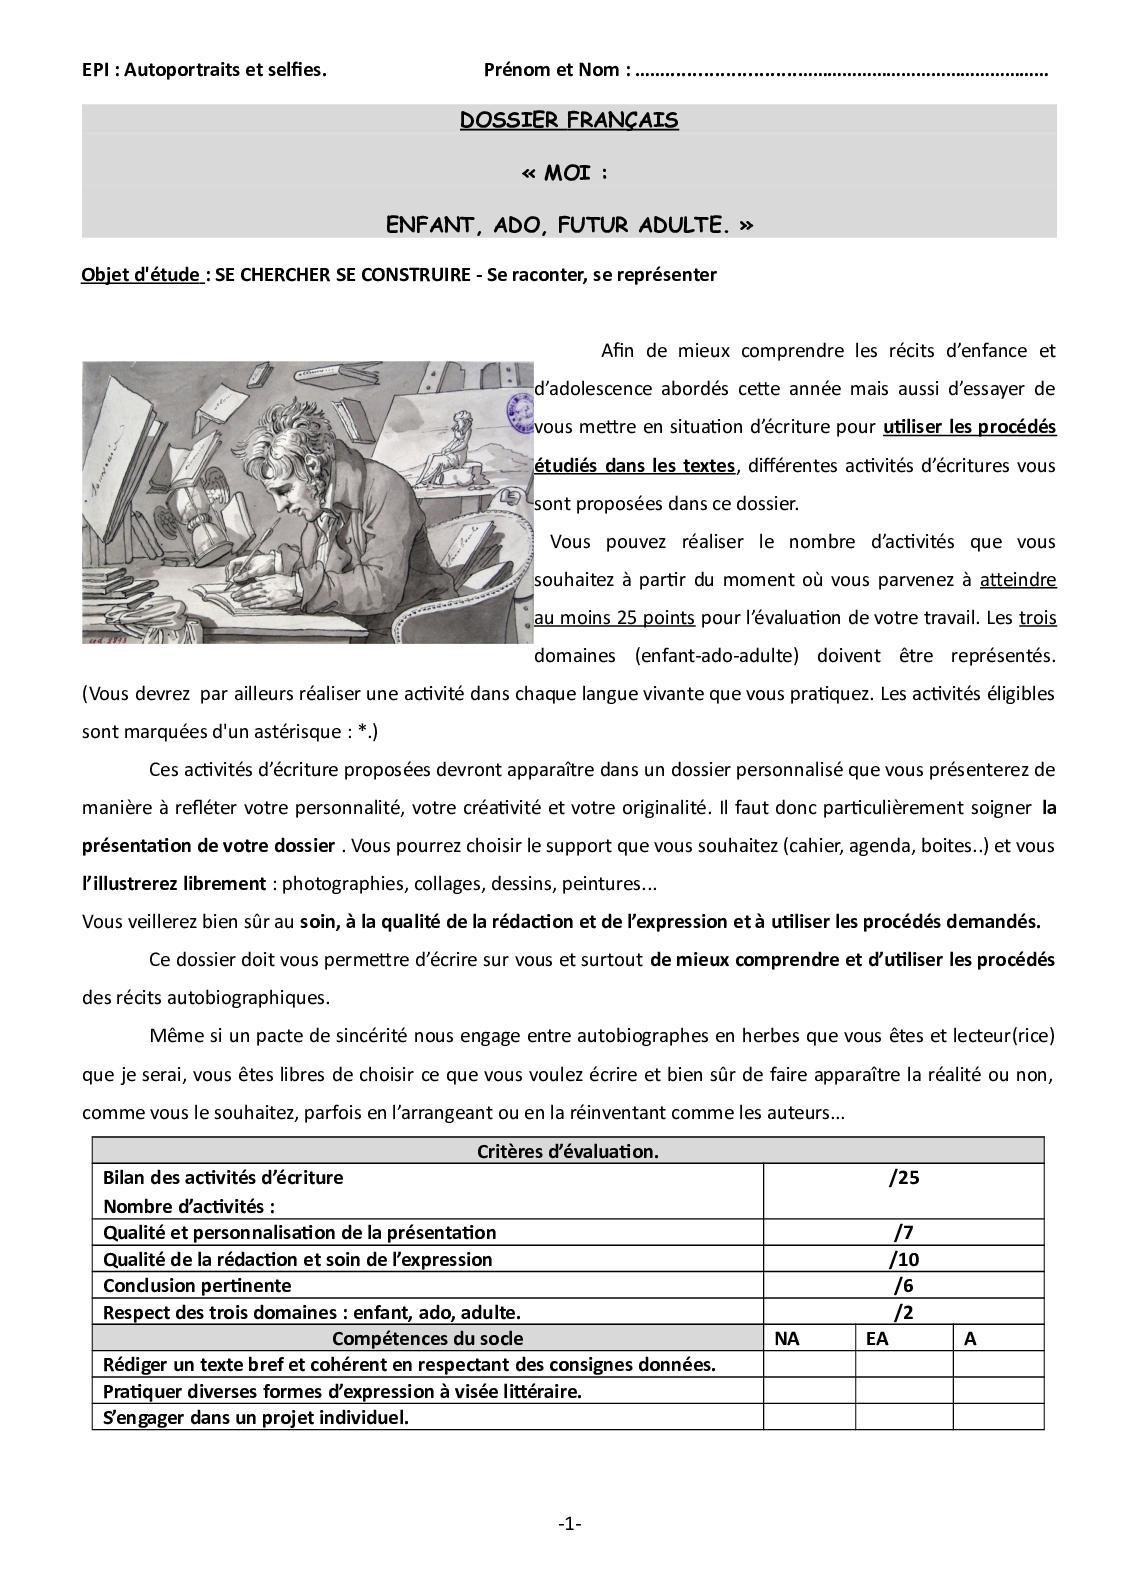 Calameo Dossier Moi Enfant Version Modifiee 14 09 17